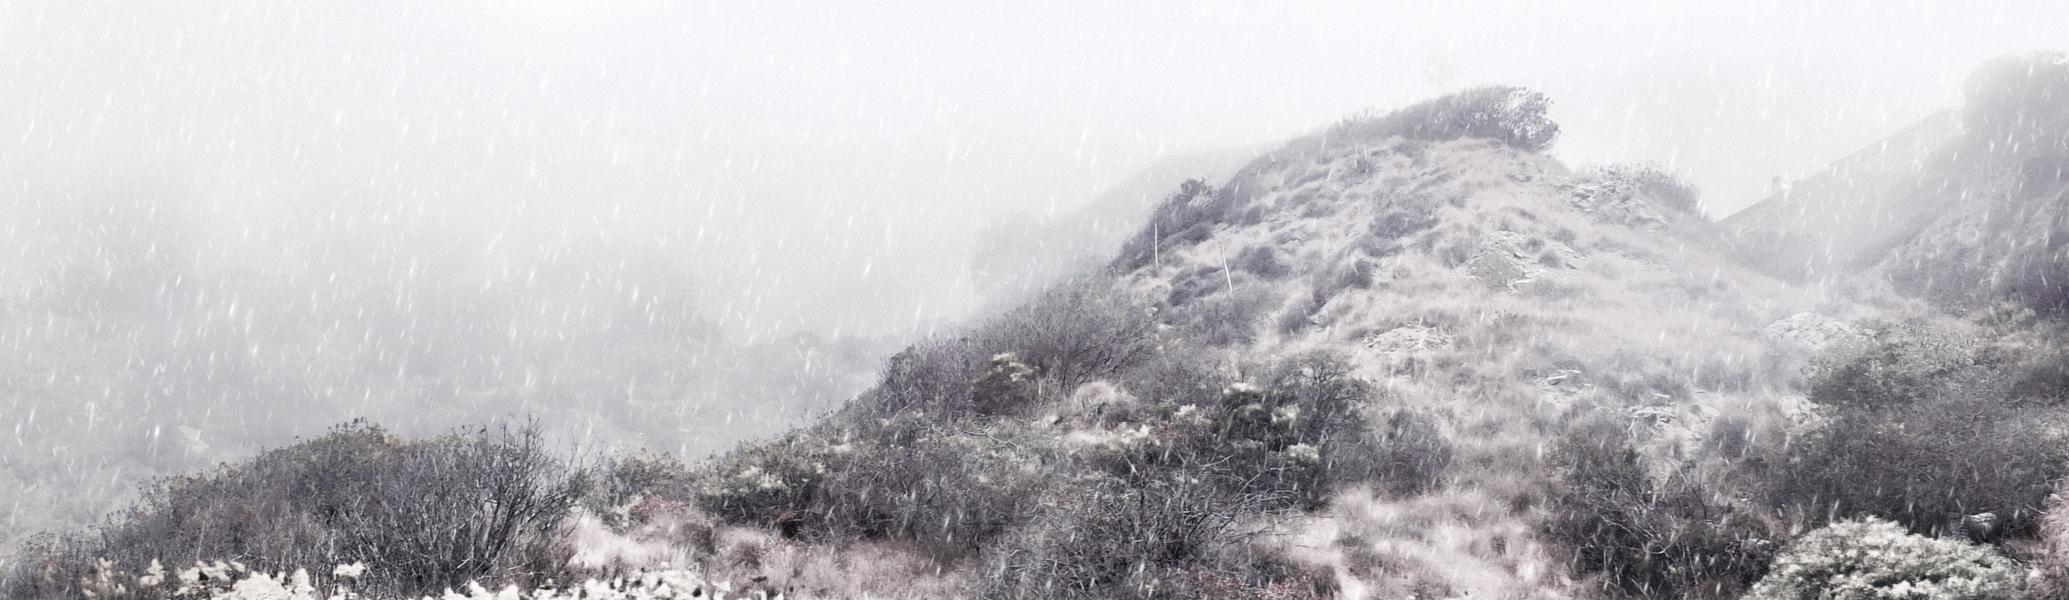 First Snowstorm, 2018